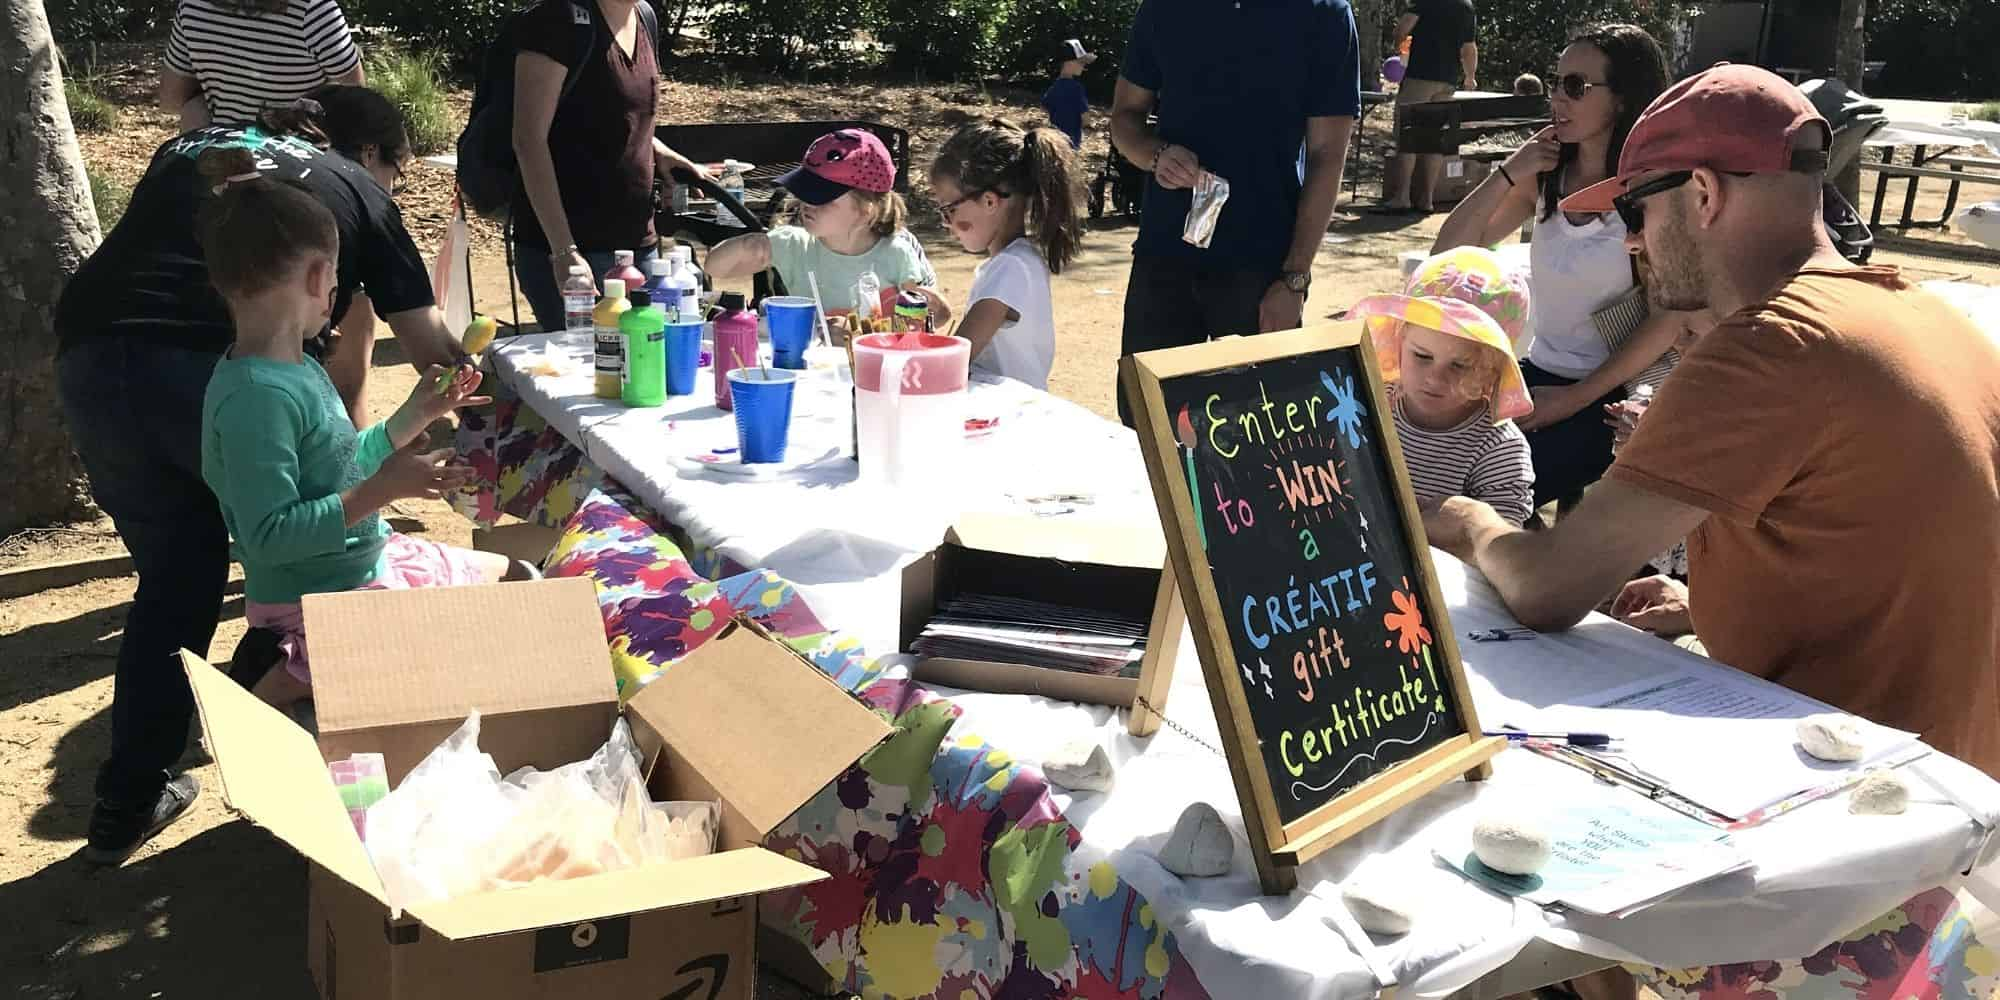 Art activity fundraiser